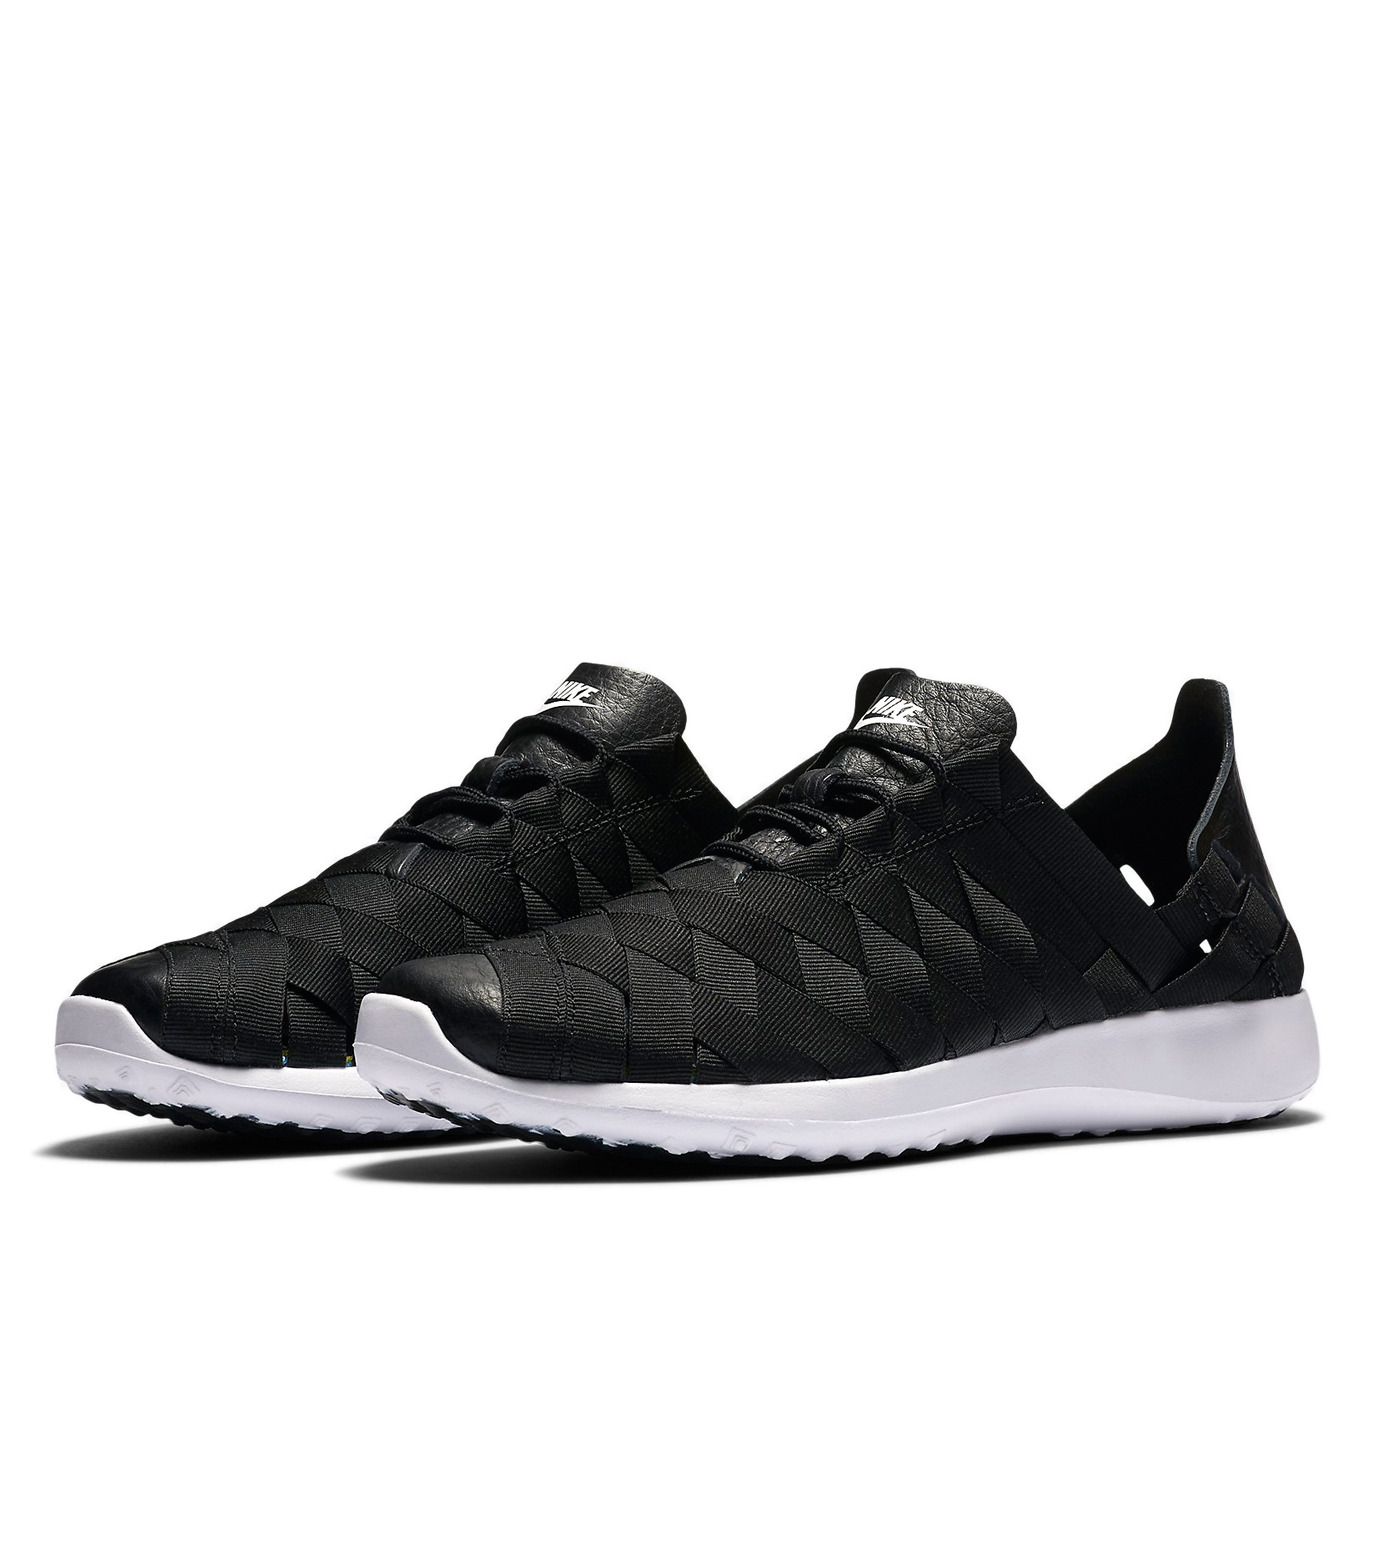 NIKE(ナイキ)のW JUVENATE-BLACK(シューズ/shoes)-833824-001-13 拡大詳細画像3